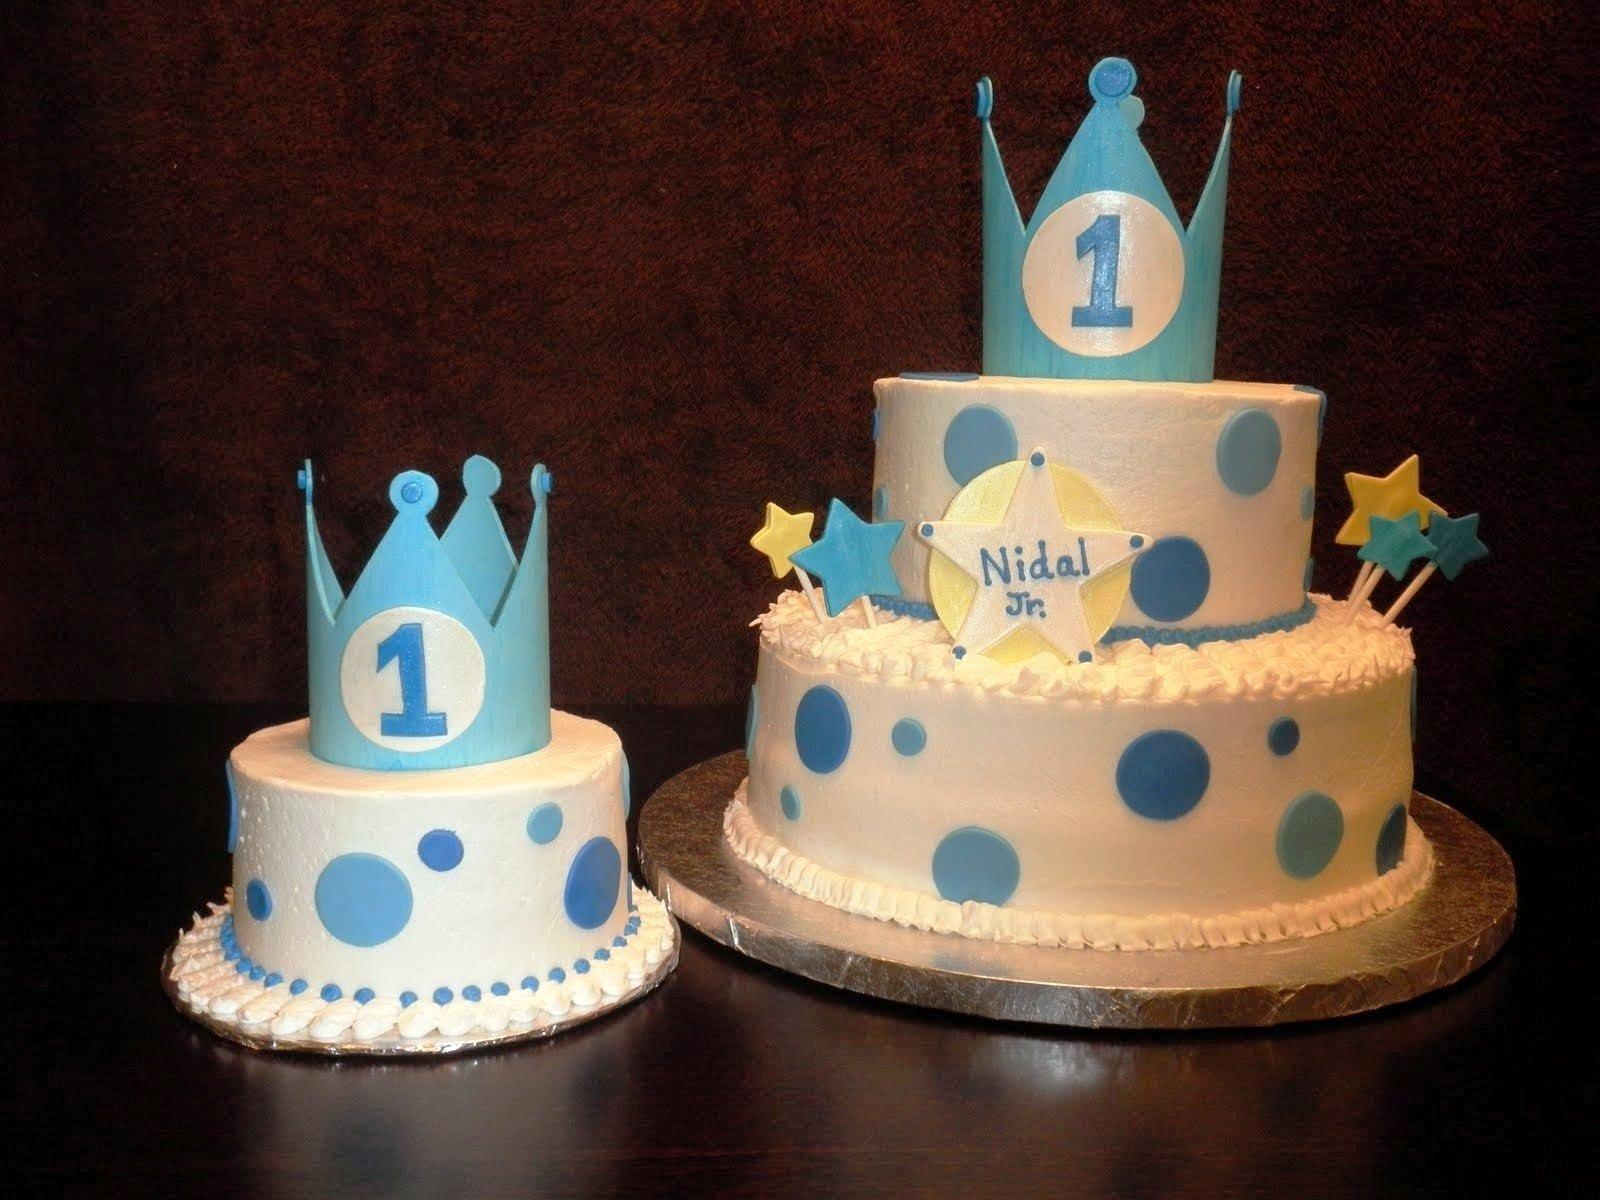 10 Unique First Birthday Cake Ideas Boy 32 incredible models regarding 1st birthday cake ideas that you 1 2021